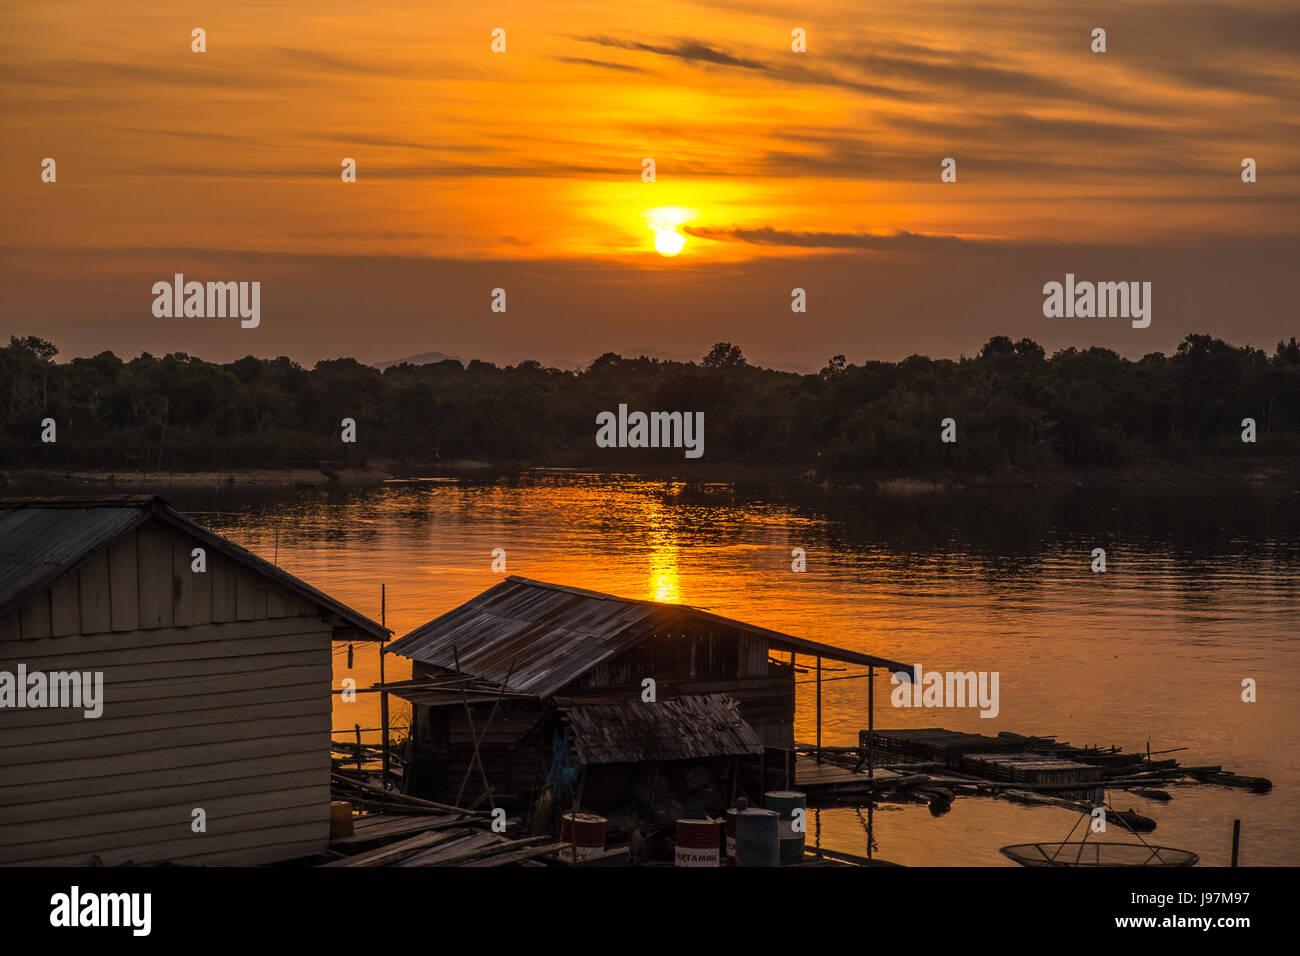 Warm sunset in Lake Sentarum in the Heart Of Borneo, Kalimantan Indonesia. - Stock Image